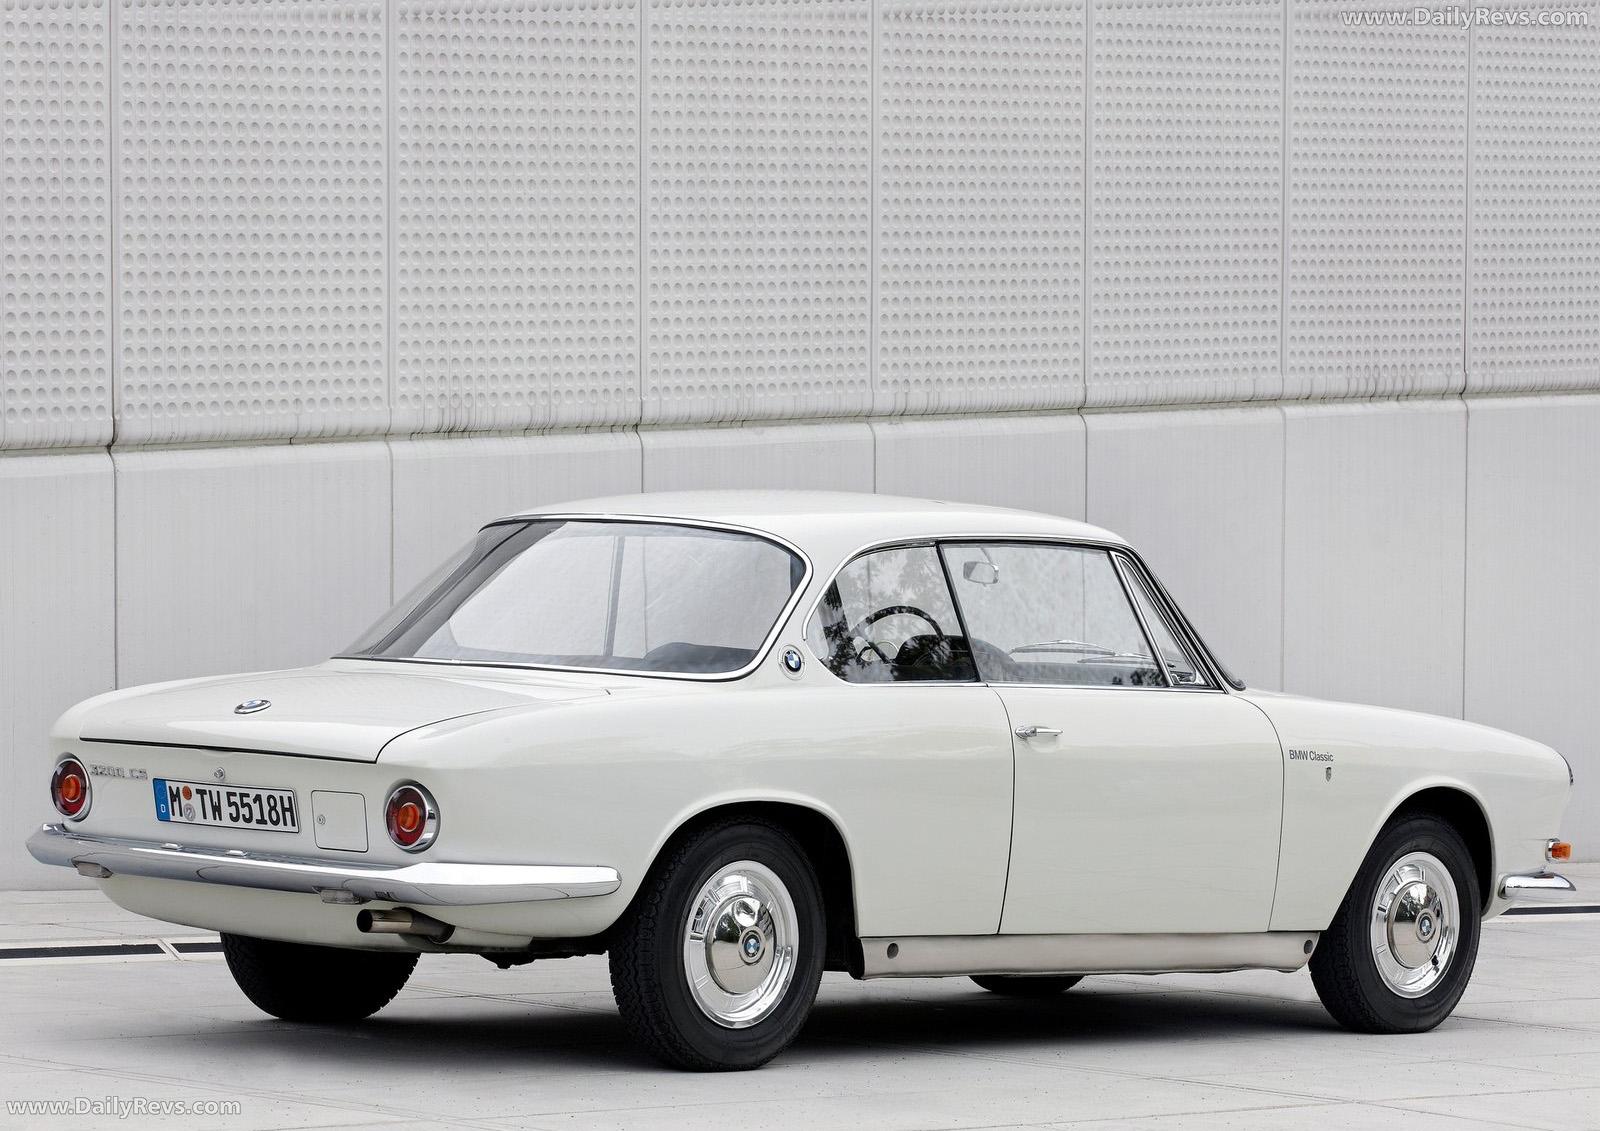 1962 BMW 3200 Coupe CS - Dailyrevs